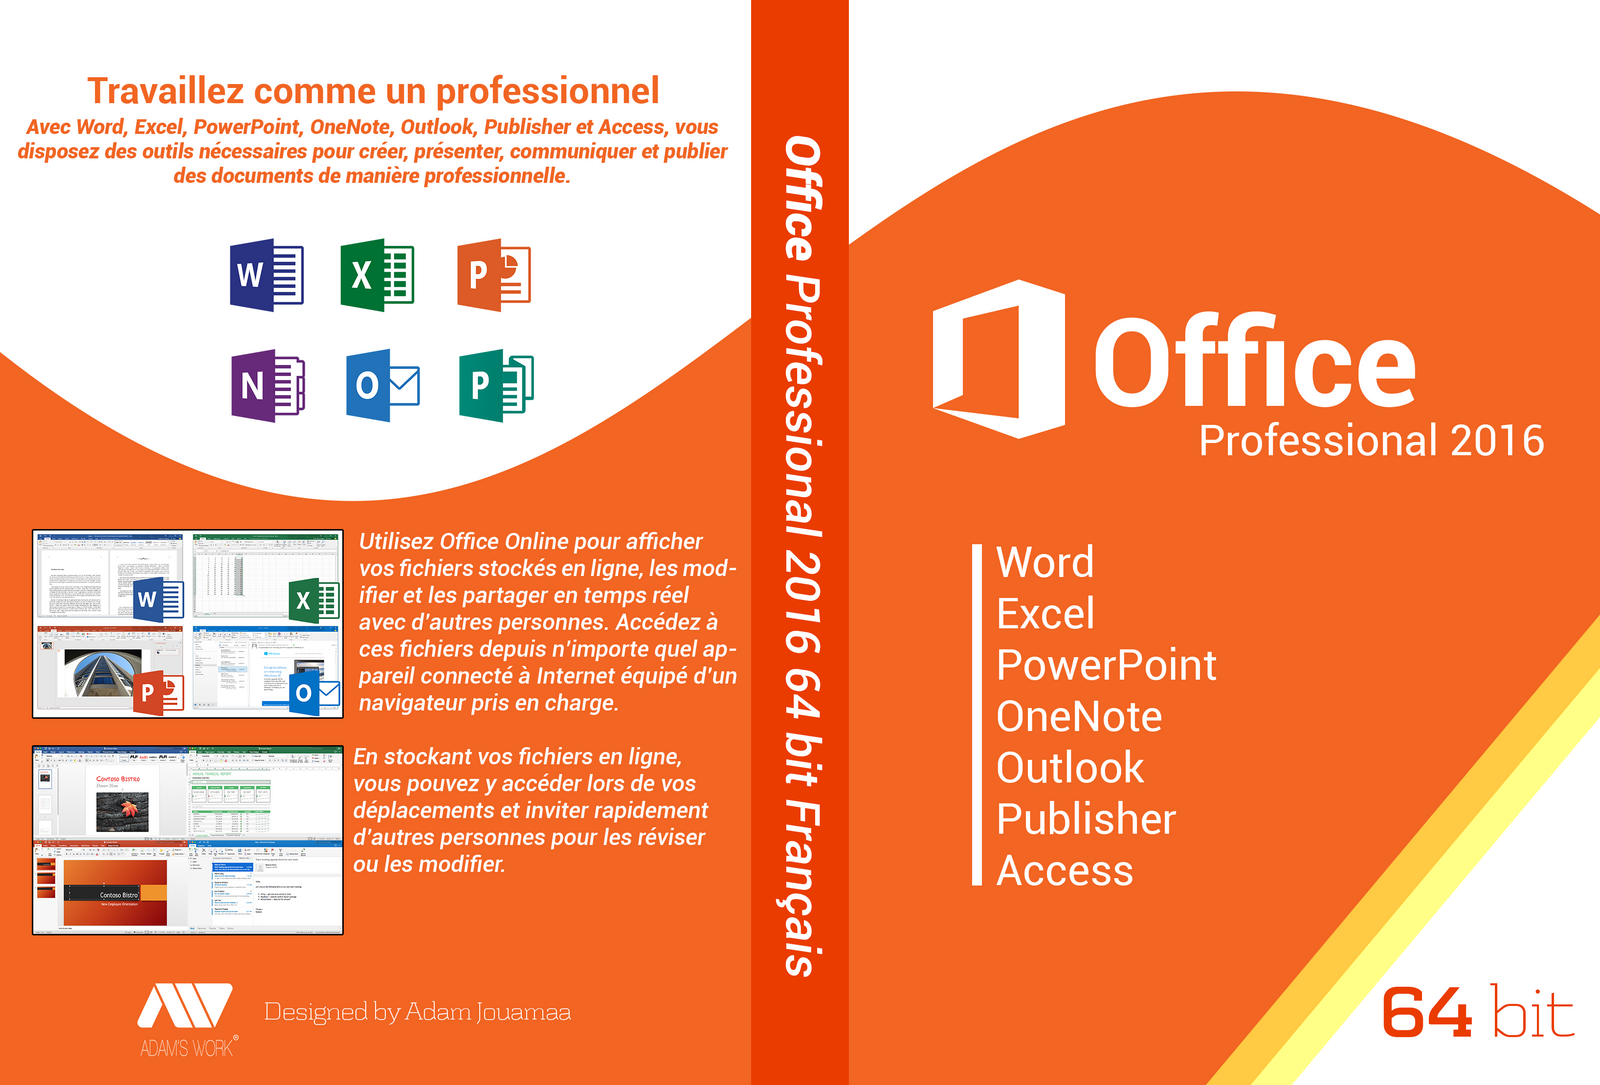 office 2016 plus 64 bit download